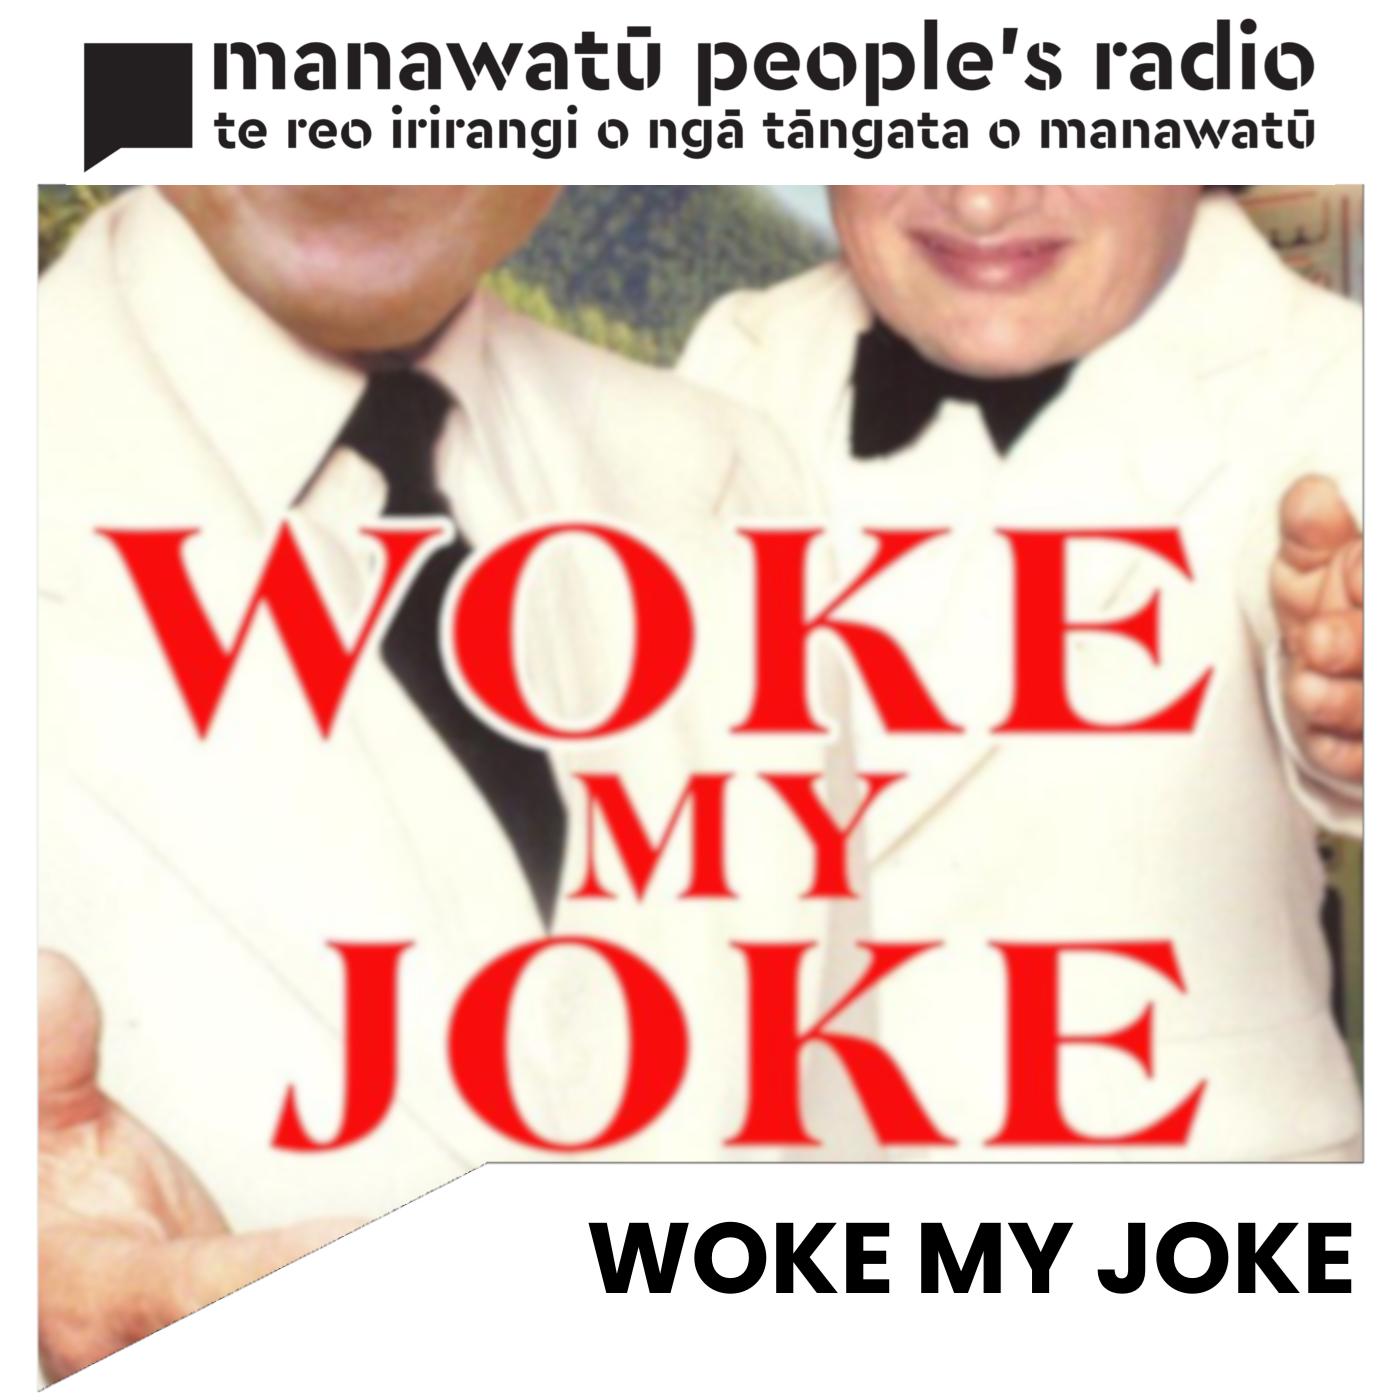 https://cdn.accessradio.org/StationFolder/manawatu/Images/MPRWokeMyJoke.png